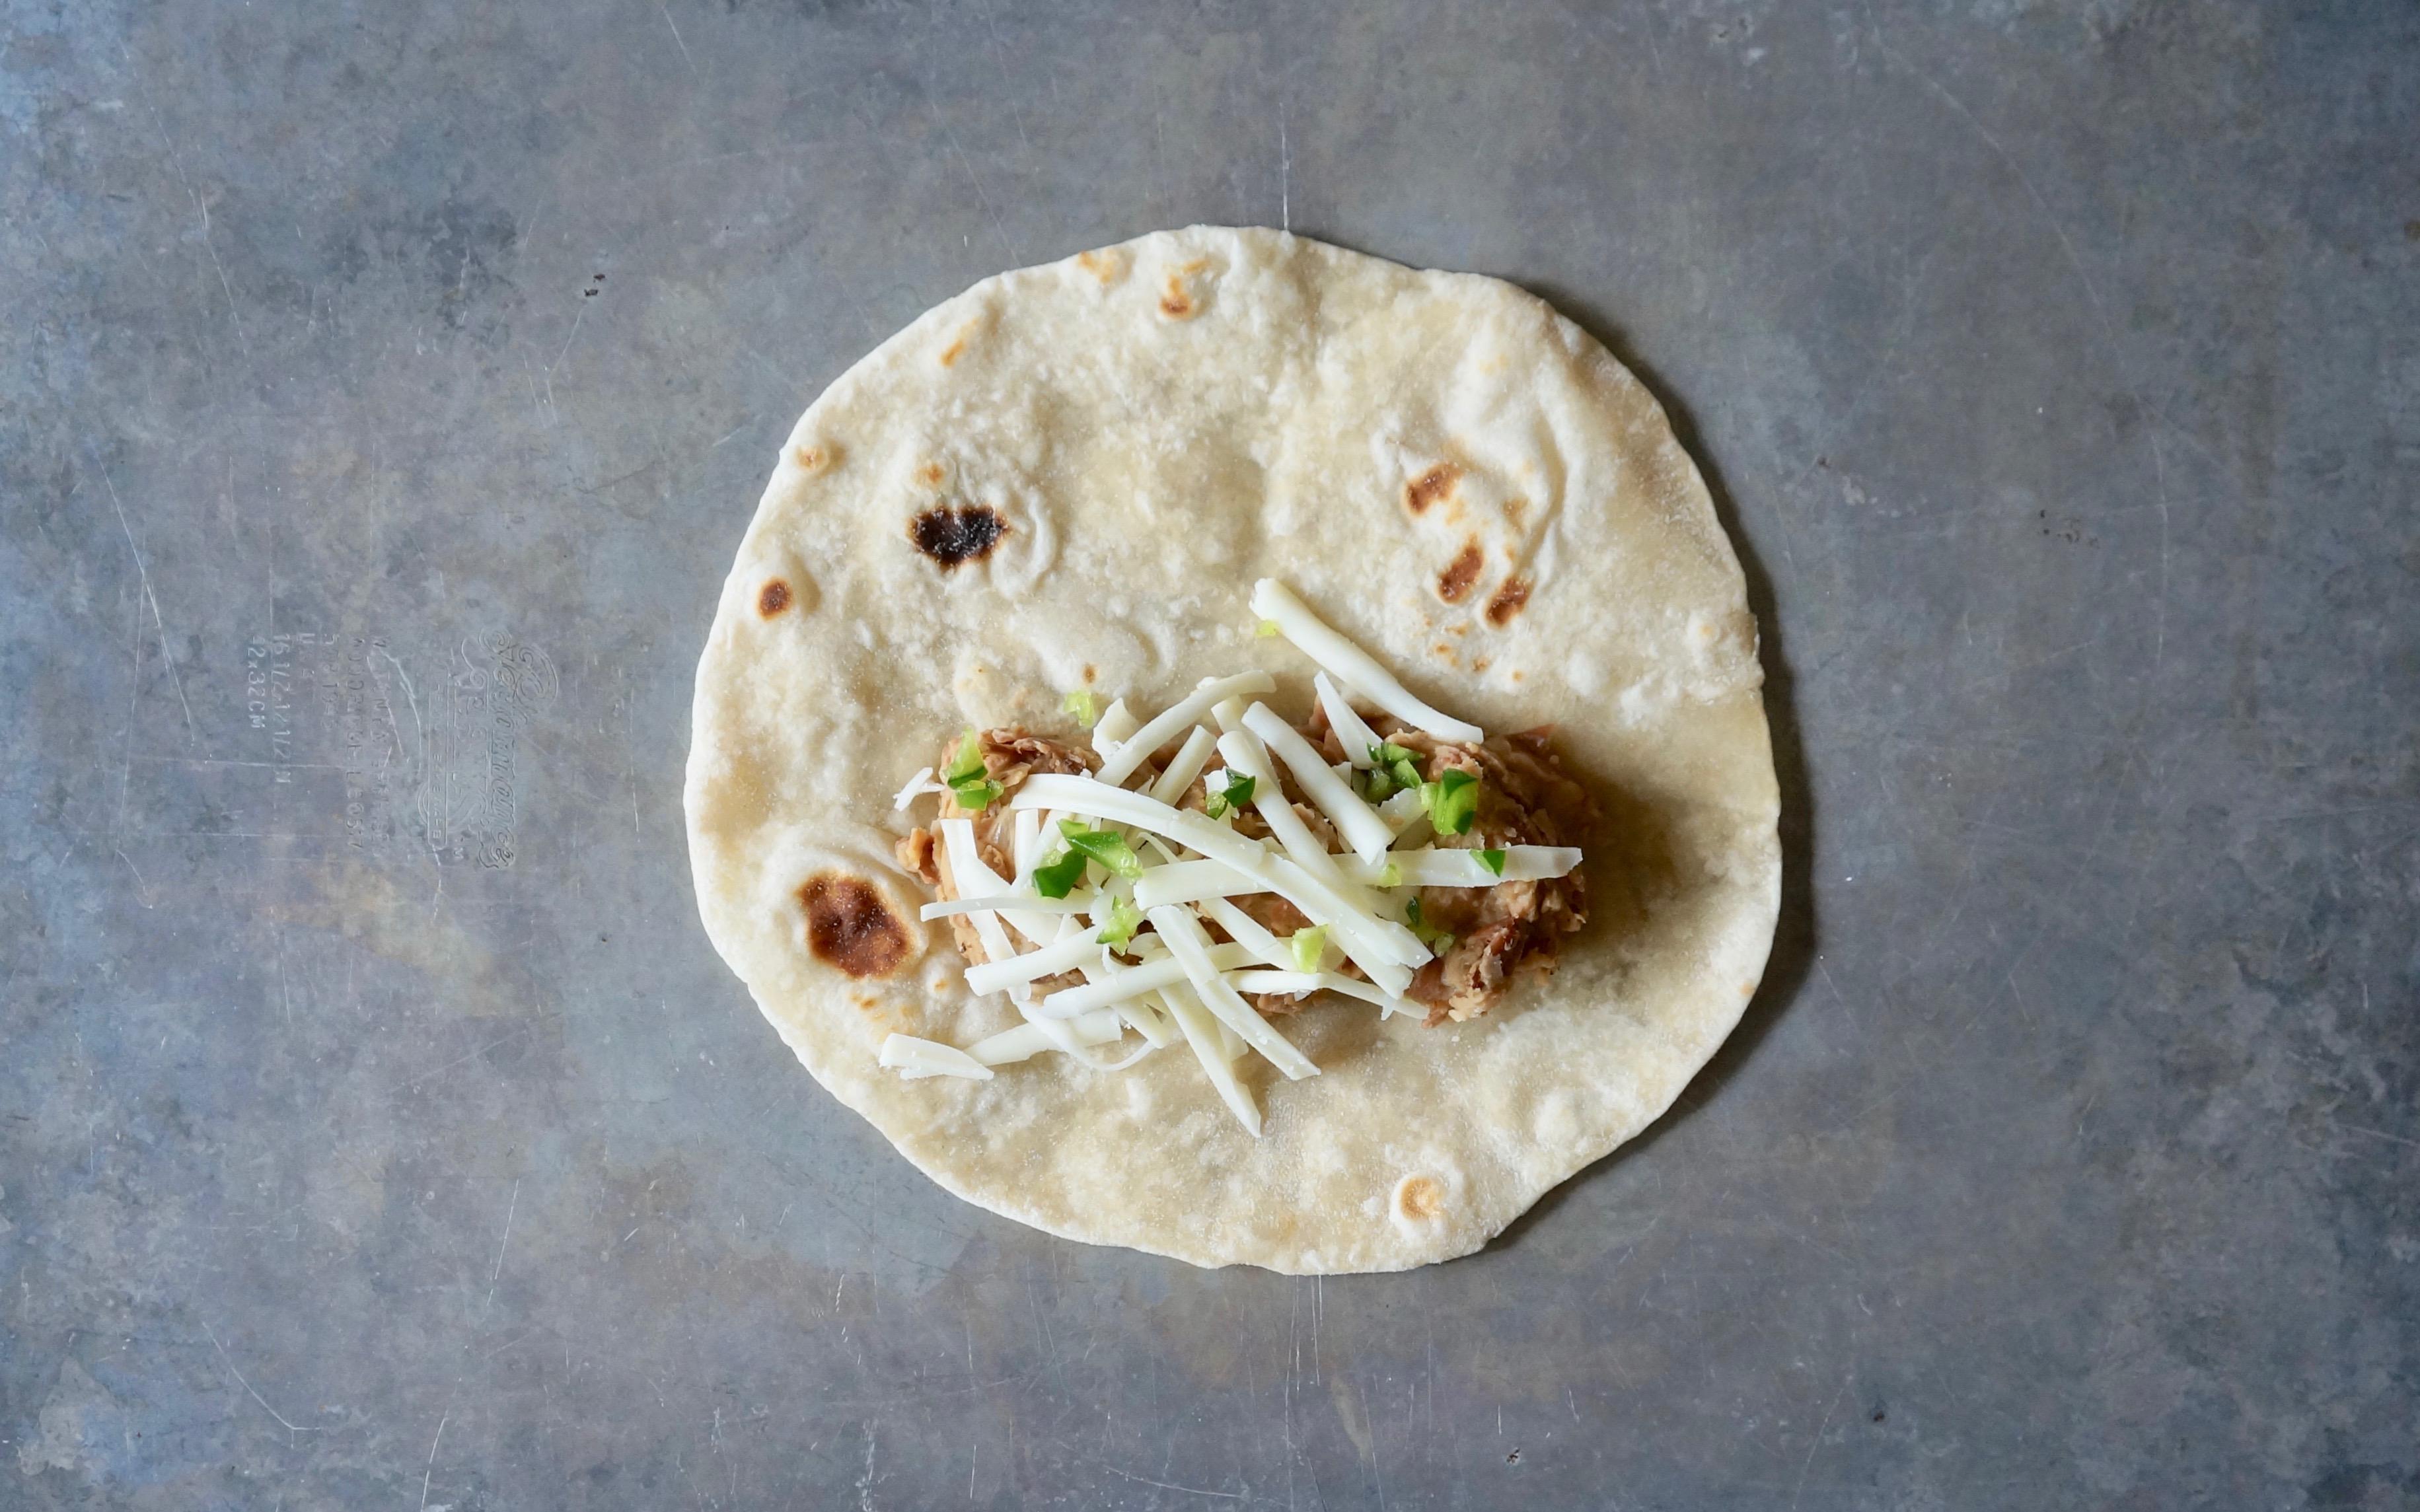 Refried-Pinto-Bean-Burritos-How-To-Fold-A-Burrito-Rebecca-Gordon-Editor-In-Chief-Buttermilk-Lipstick-Cooking-Class-Bean-Burrito-RebeccaGordon-Southern-Hostess-Pastry-Chef-Gardener-Birmingham-Alabama